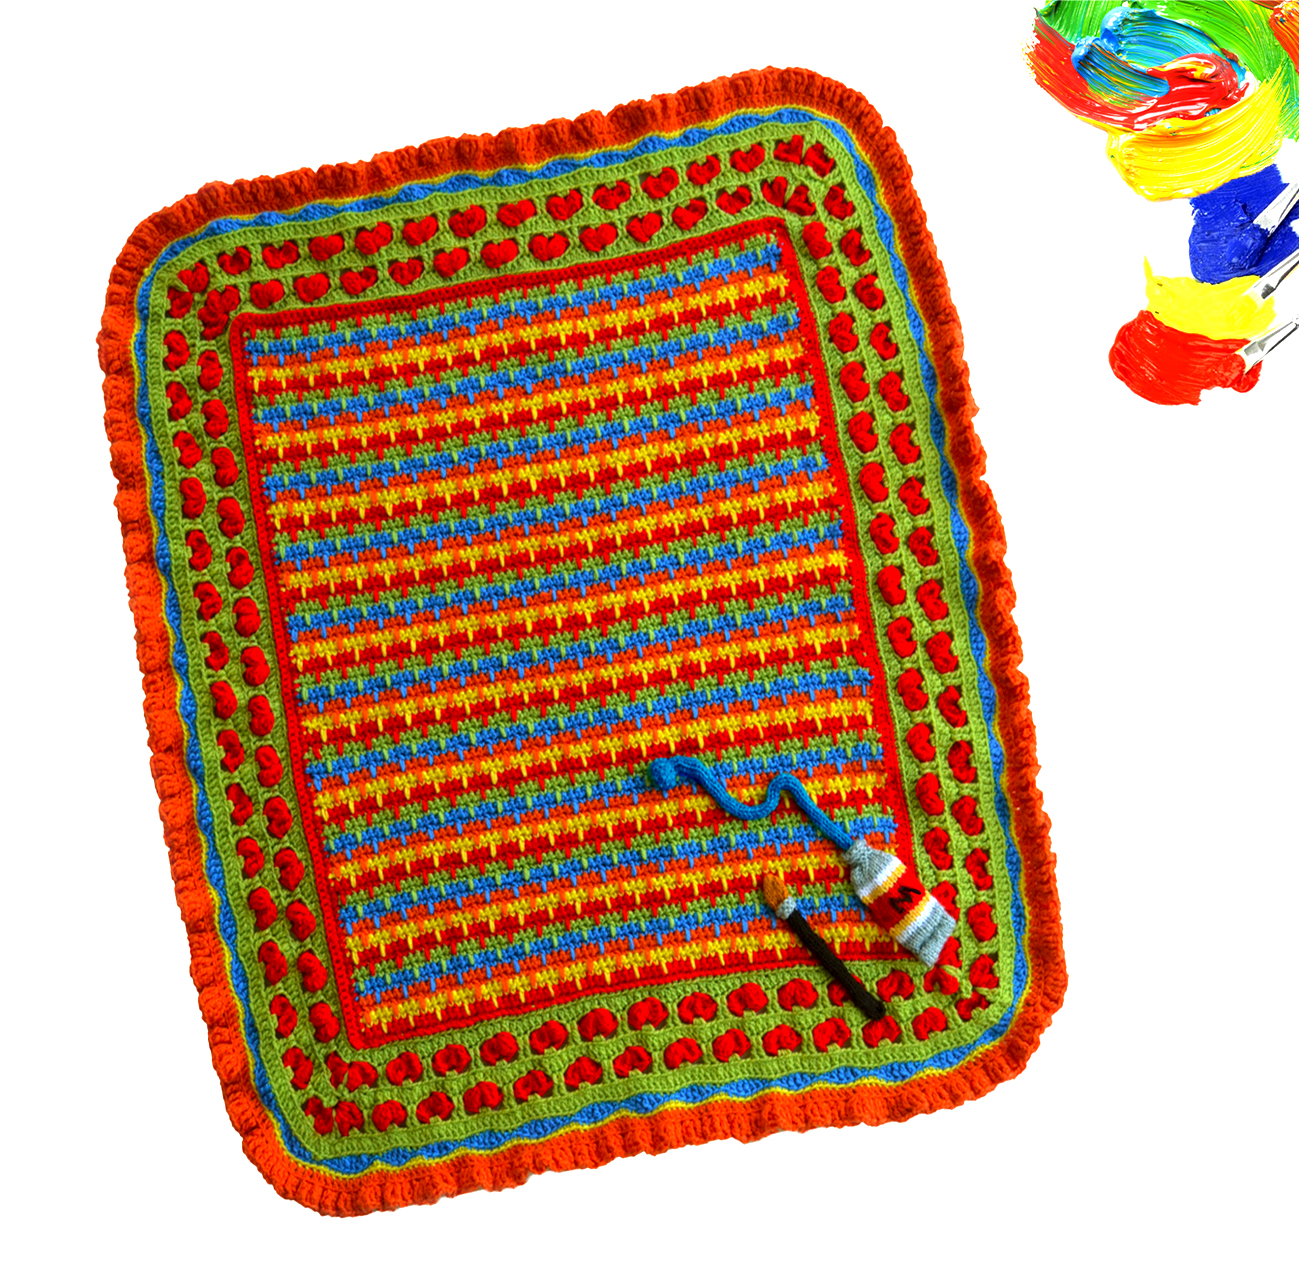 Paint Box baby blanket pattern